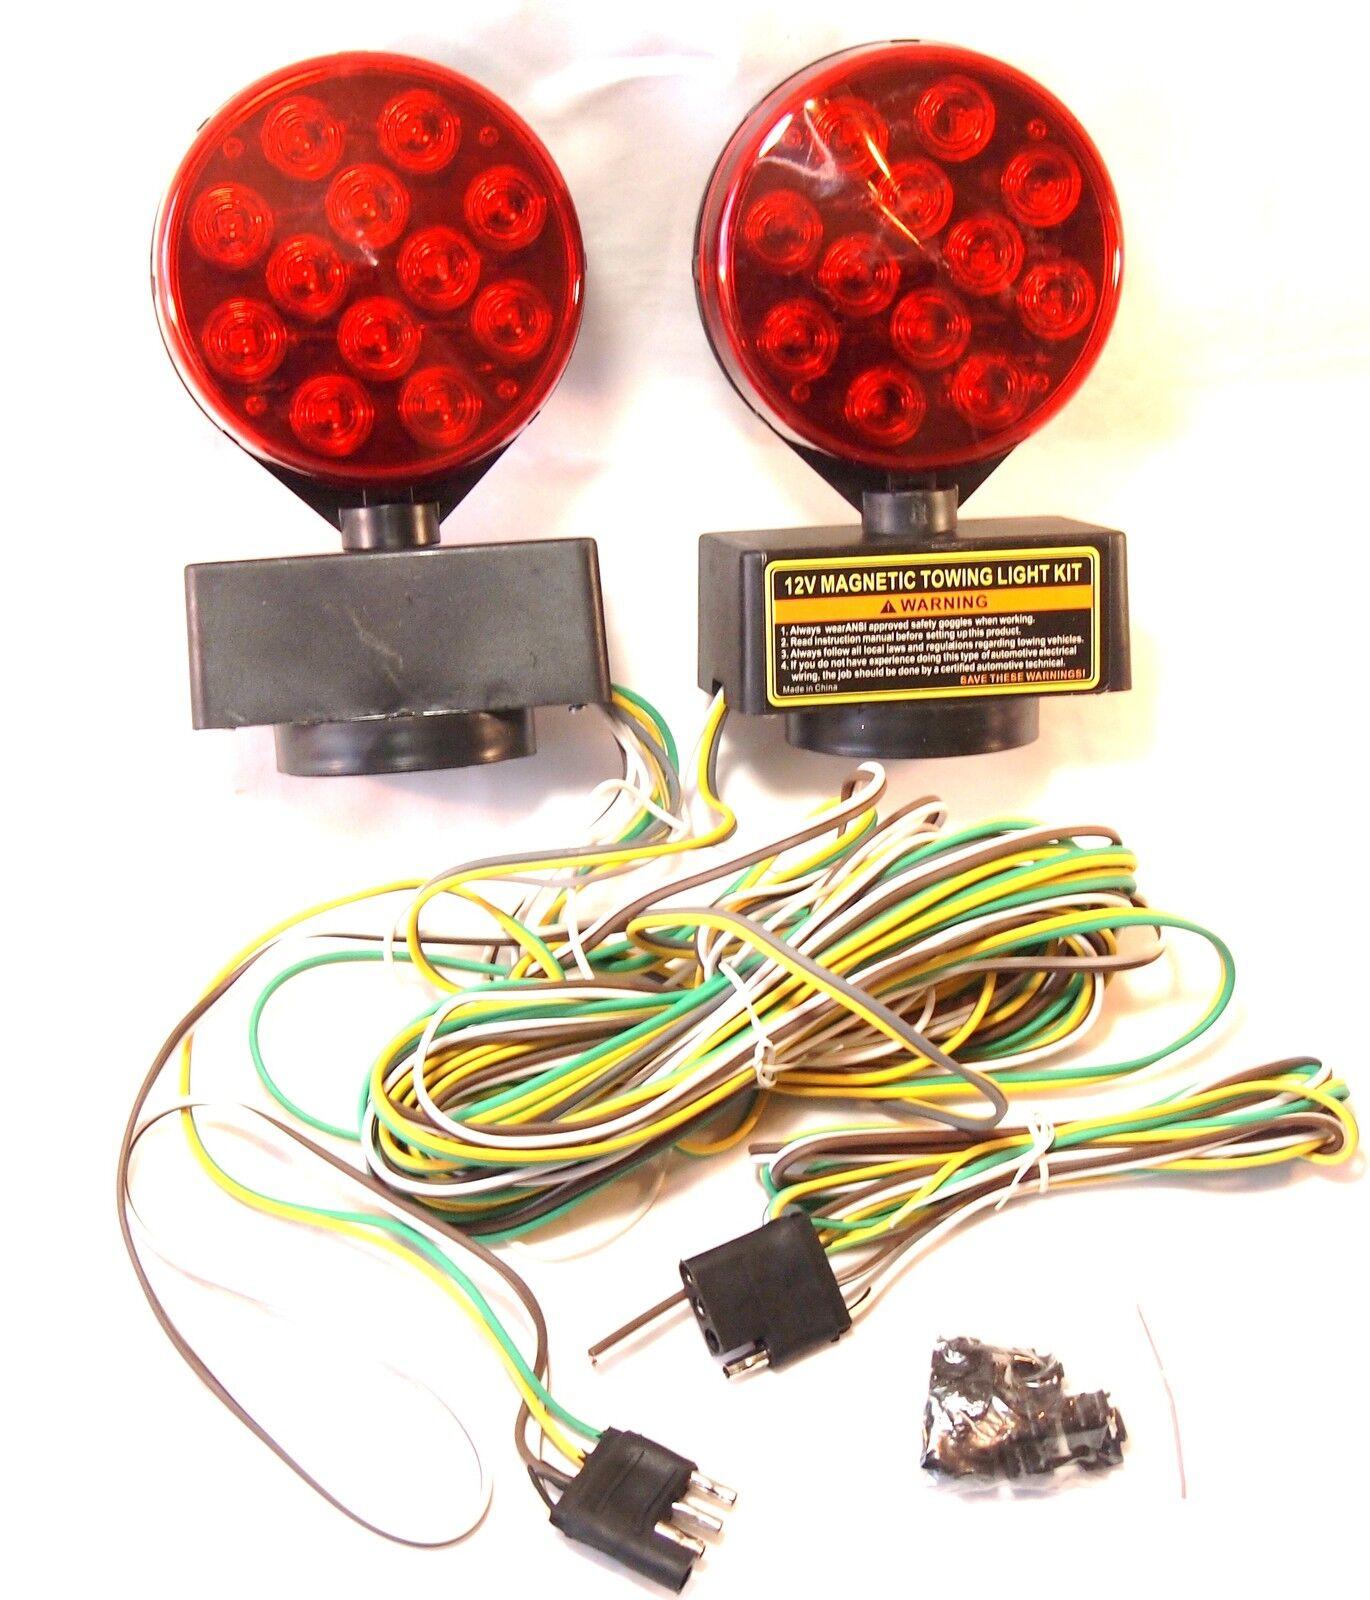 hight resolution of 12v 24 led magnetic towing trailer light kit ebay wiring harness diagram wrecker parts magnetic wiring harness